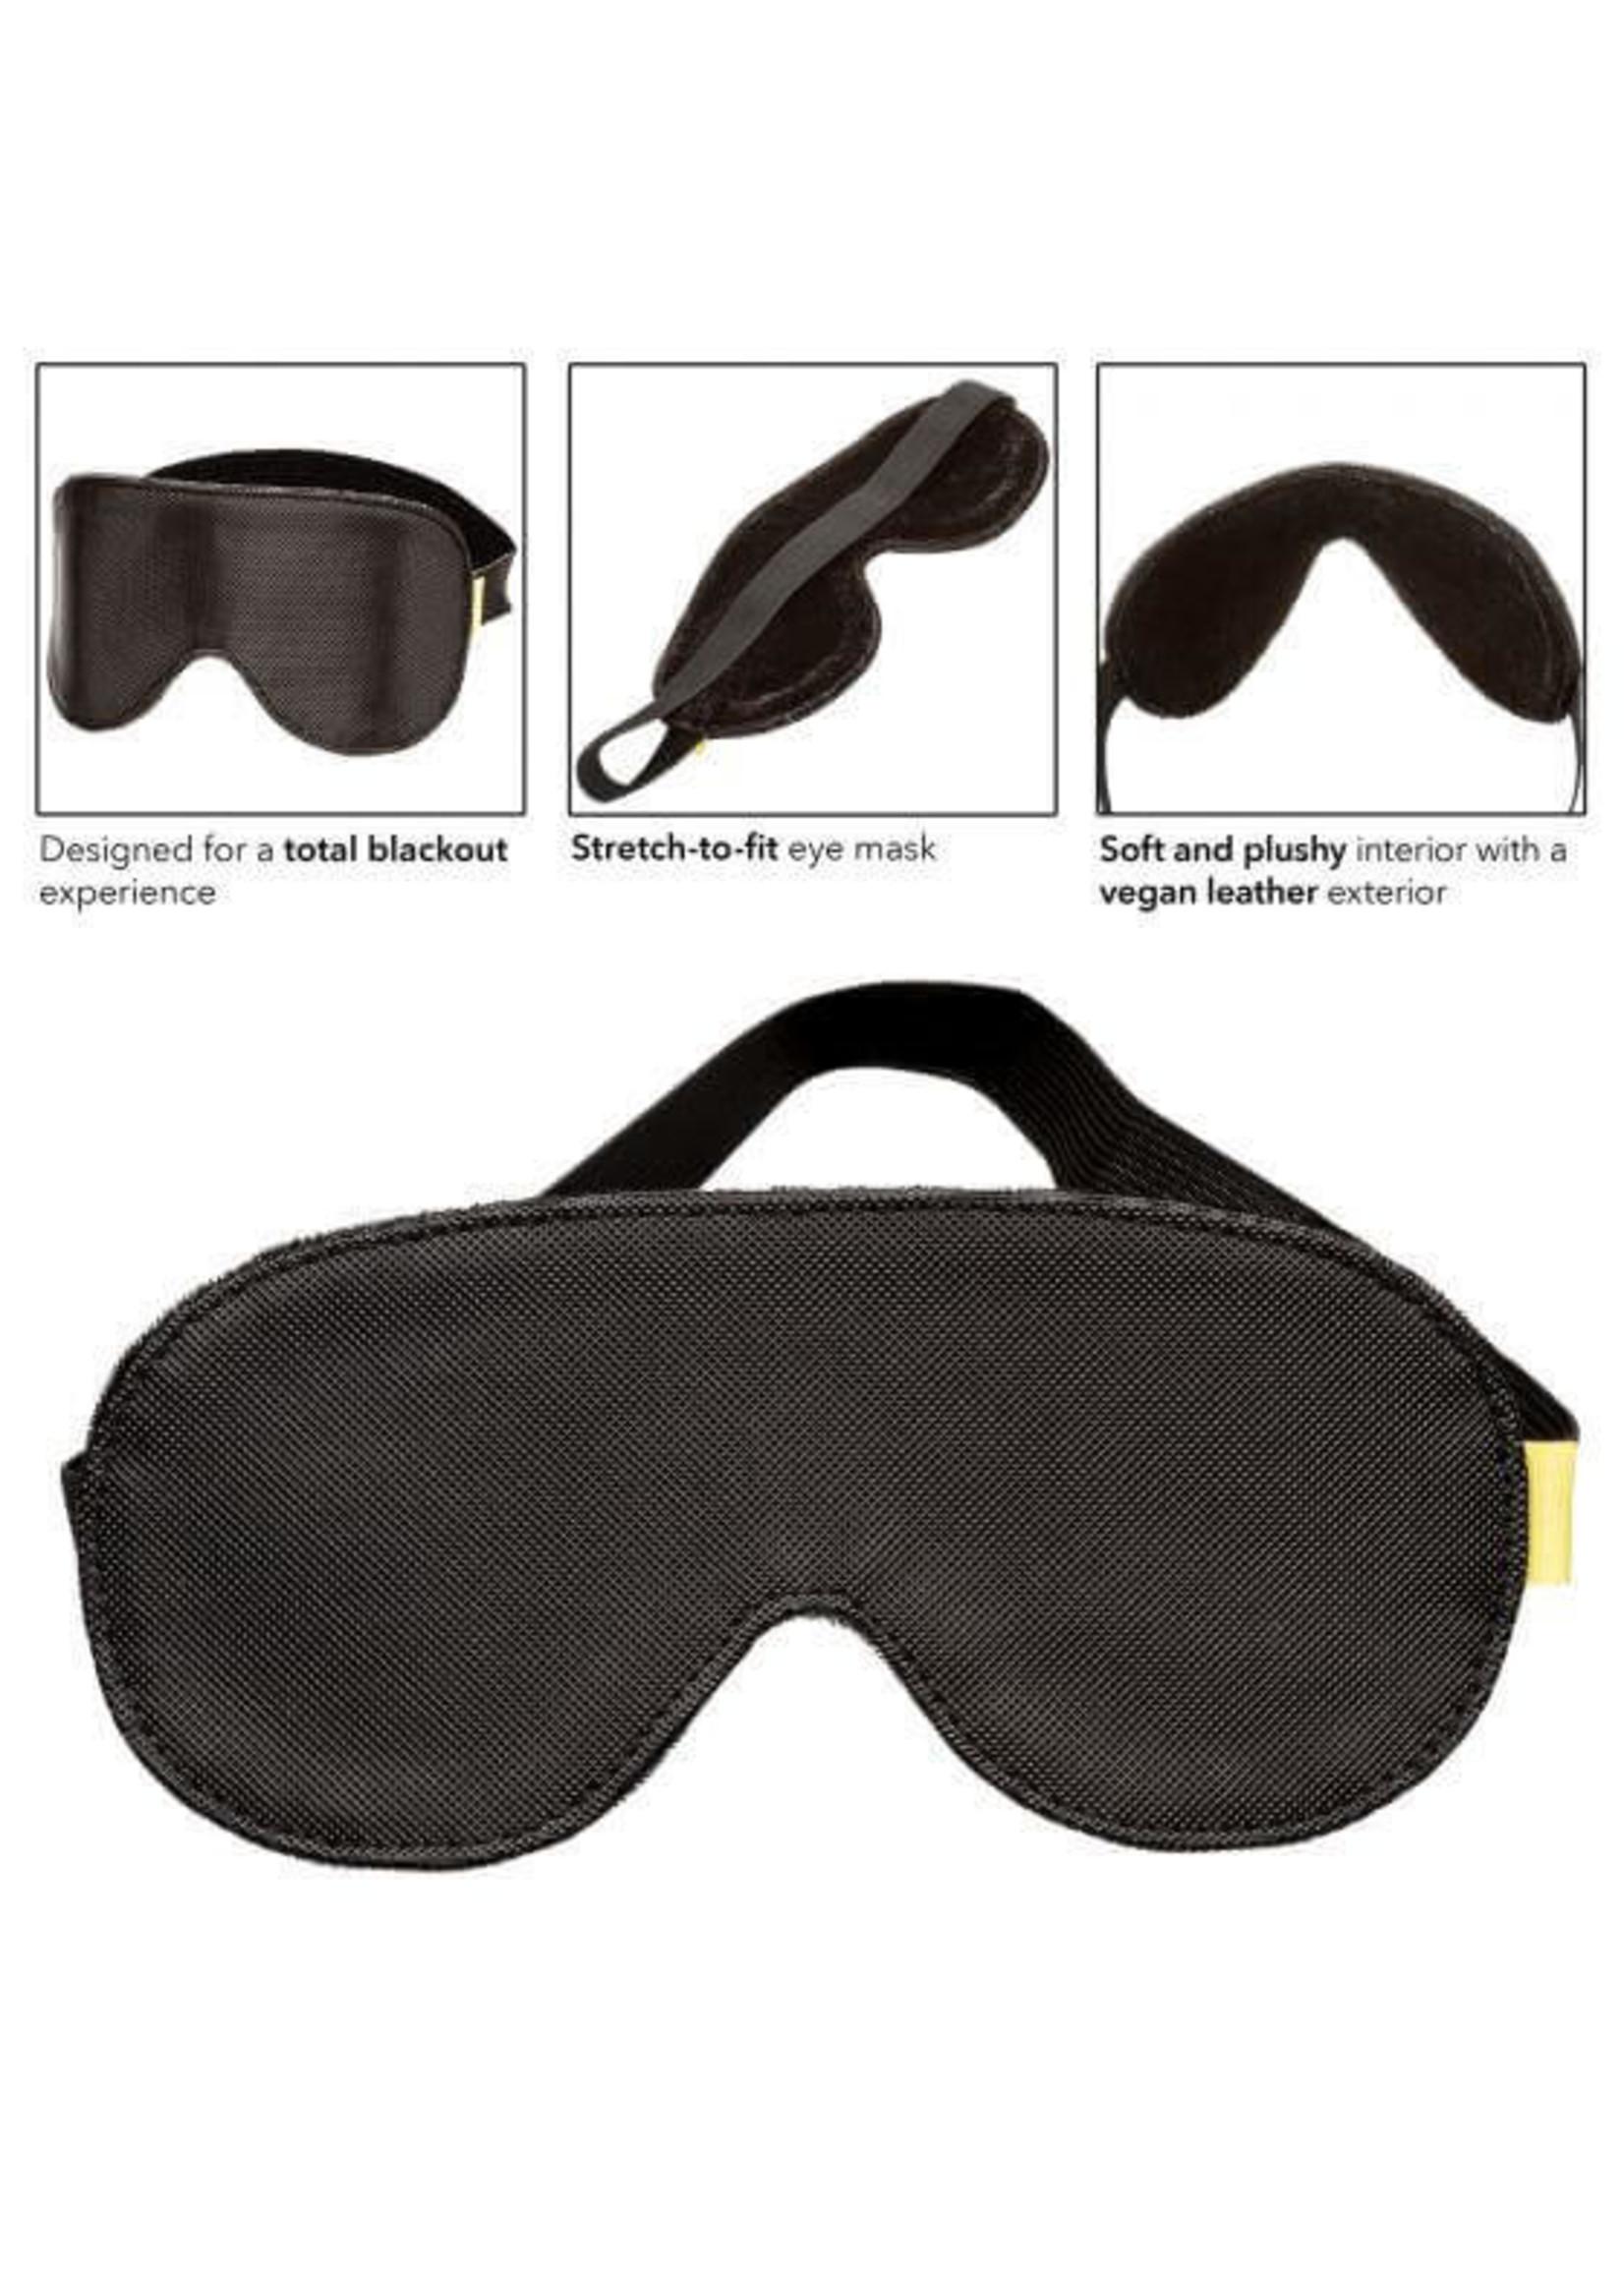 Boundless Boundless Blackout Eye Mask